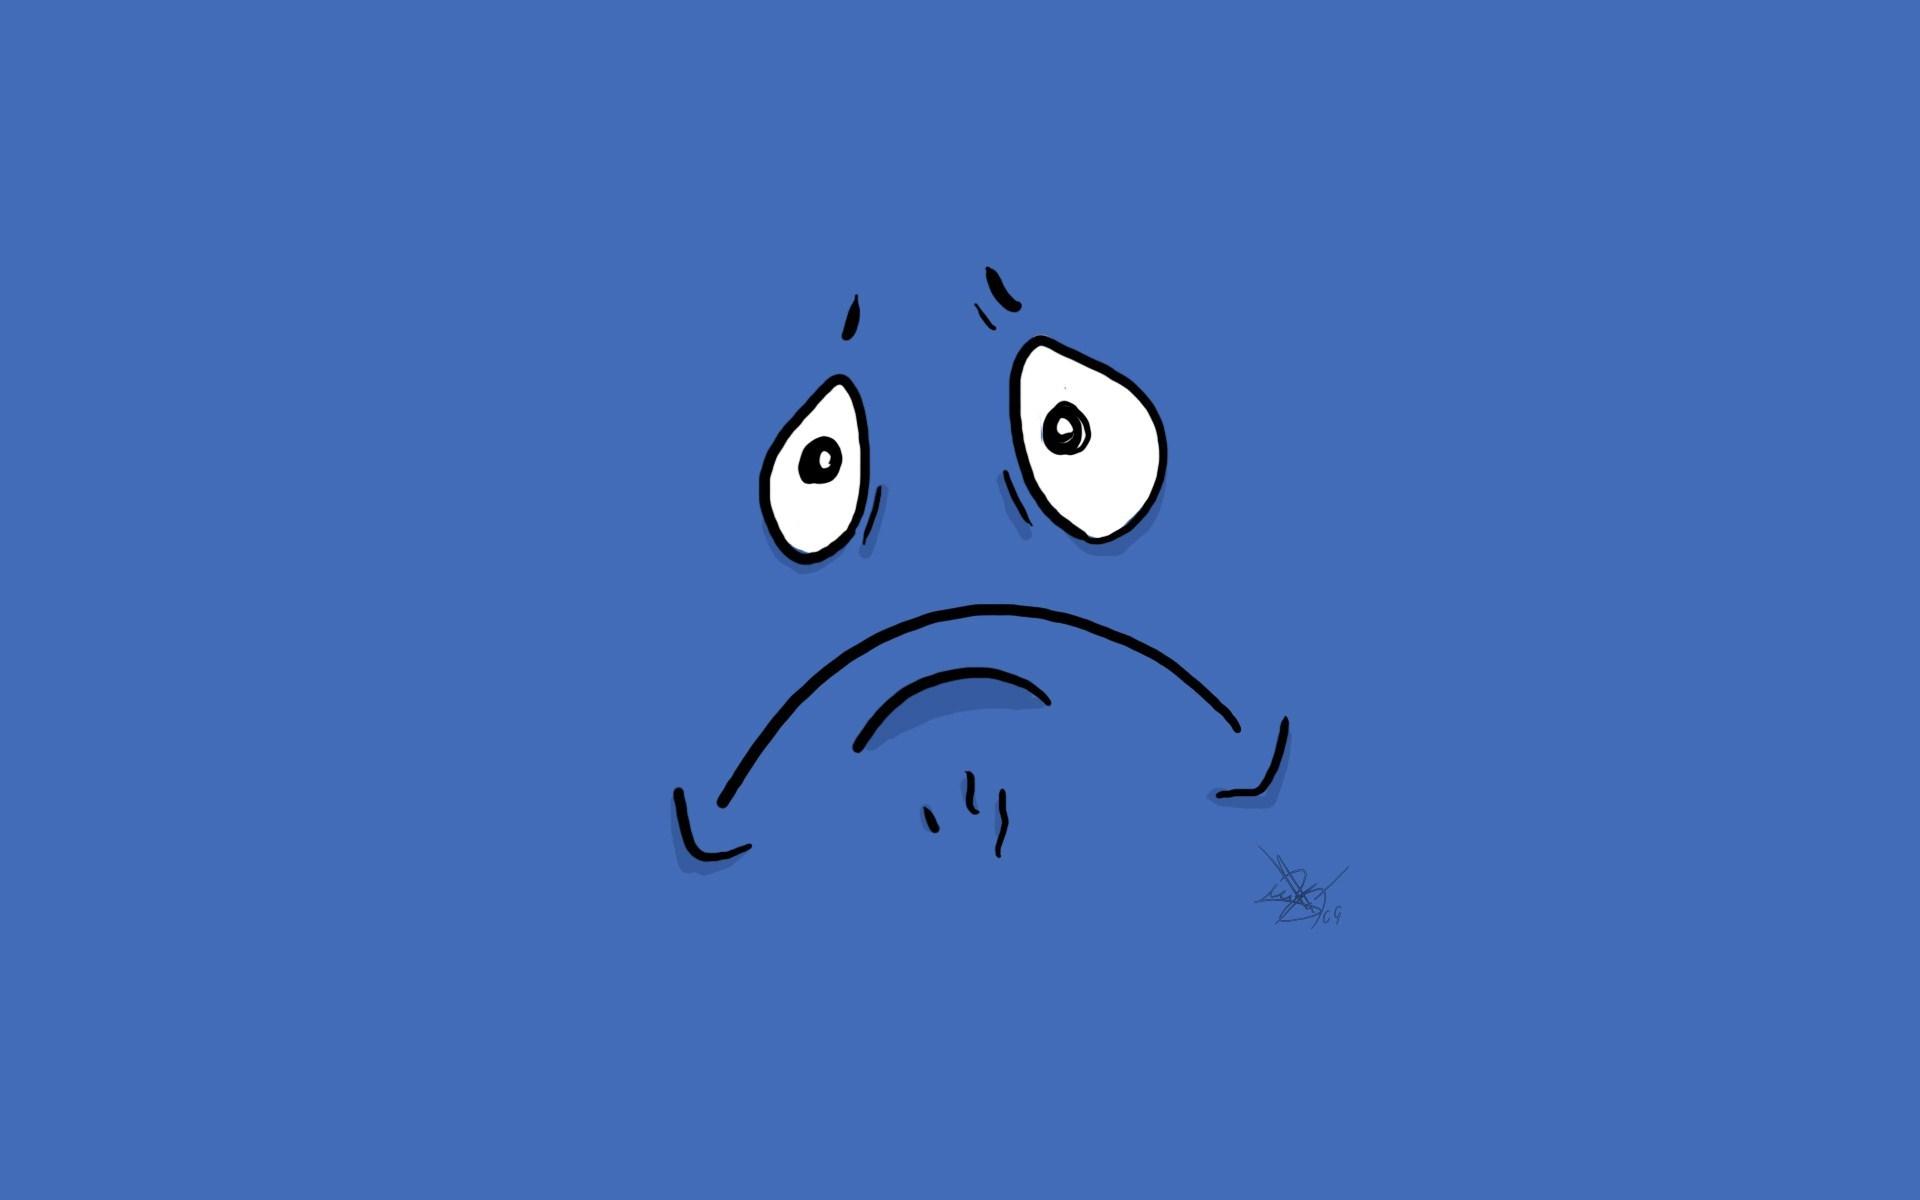 Sad Face Frustration Grief Facial Expressions Design